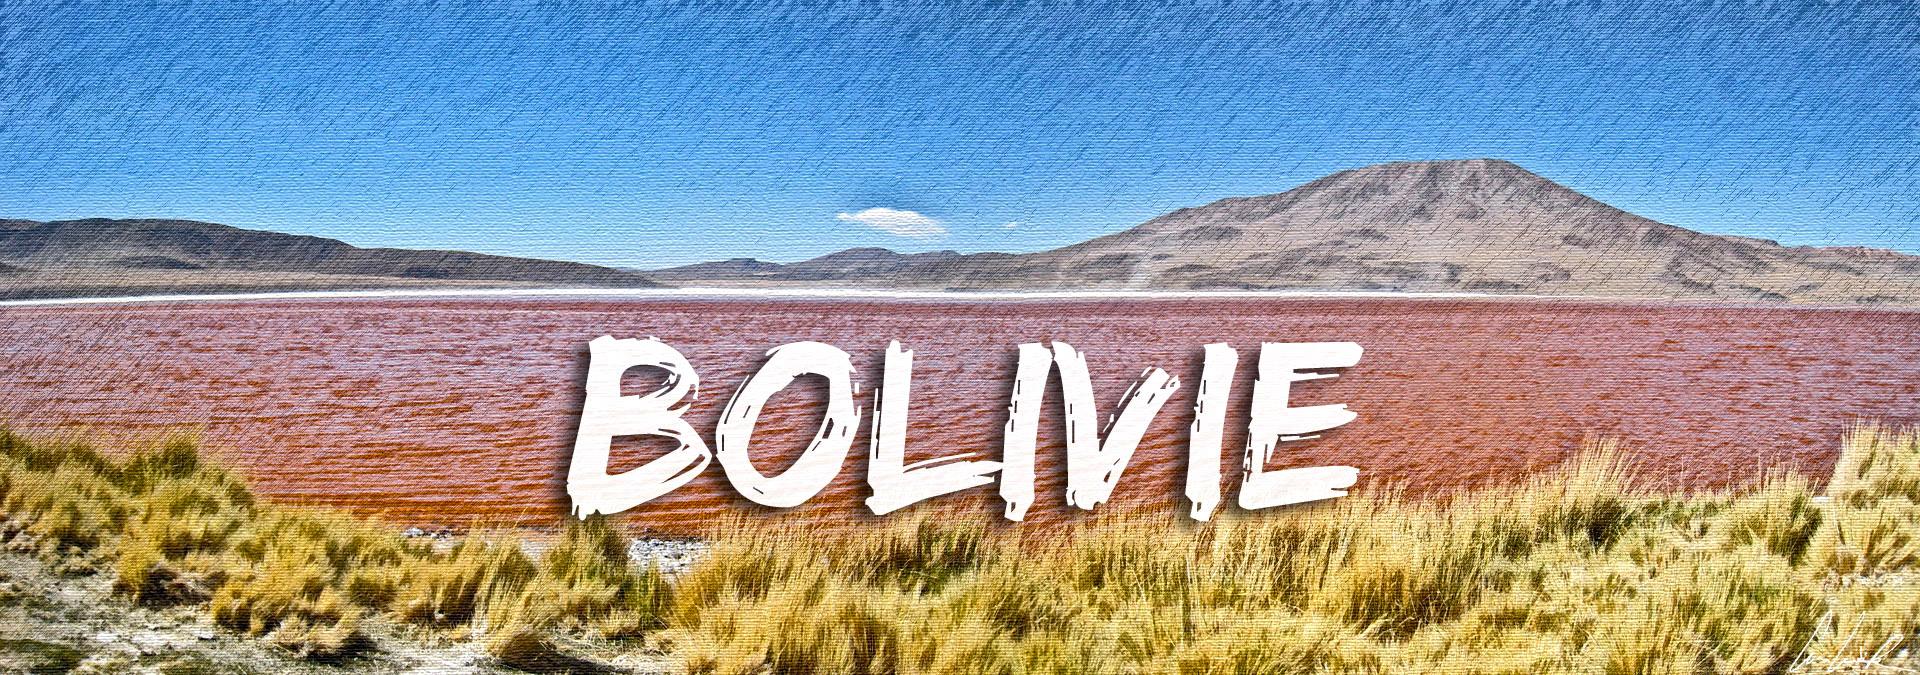 C-Ludik - Pays visité : Bolivie